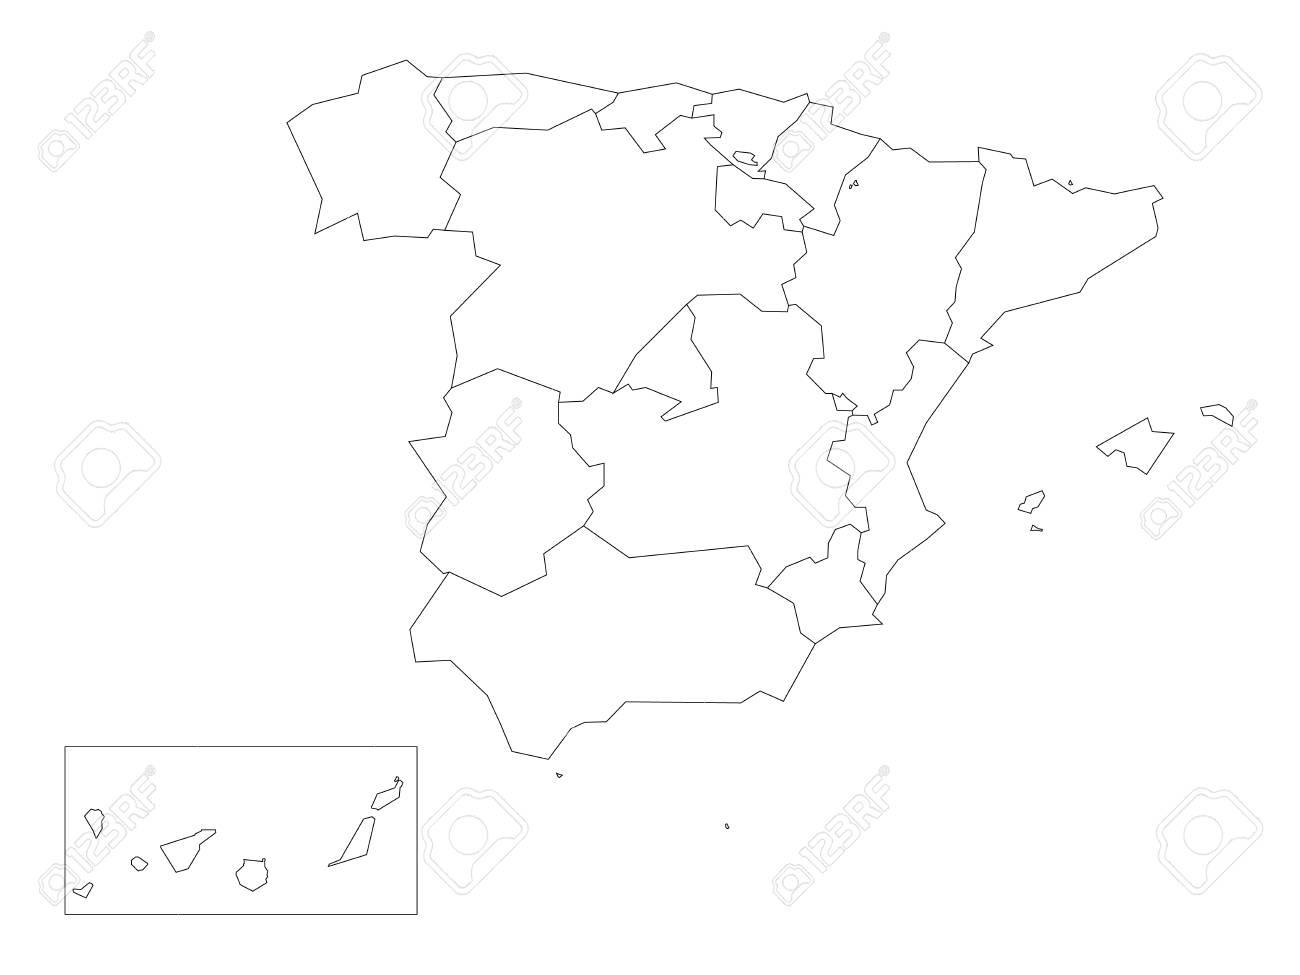 Mapa De Comunidades Autonomas En Blanco.Mapa De Espana Dividido En 17 Comunidades Autonomas Administrativas Esquema Negro Delgado Simple Sobre Fondo Blanco